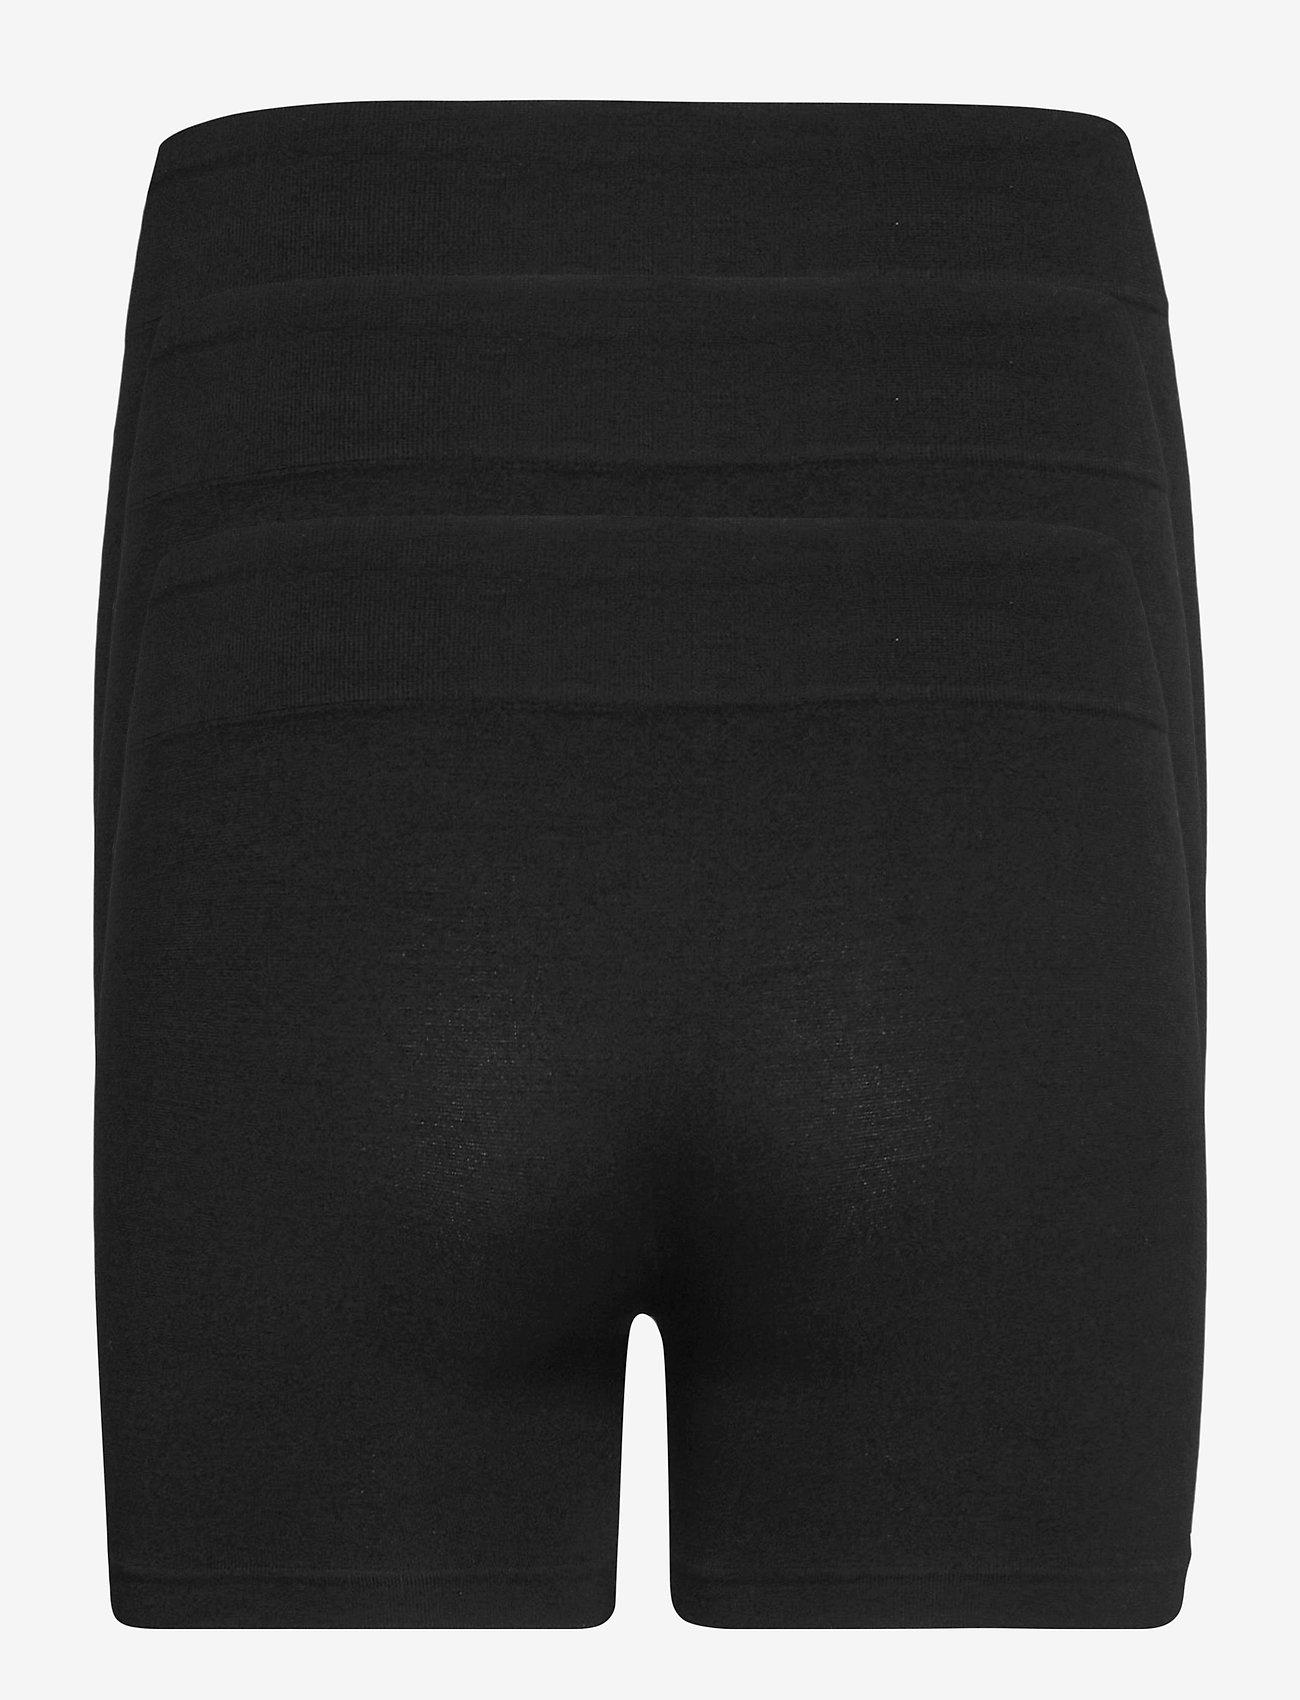 Decoy - DECOY 3-pack hot pants - bottoms - svart - 1